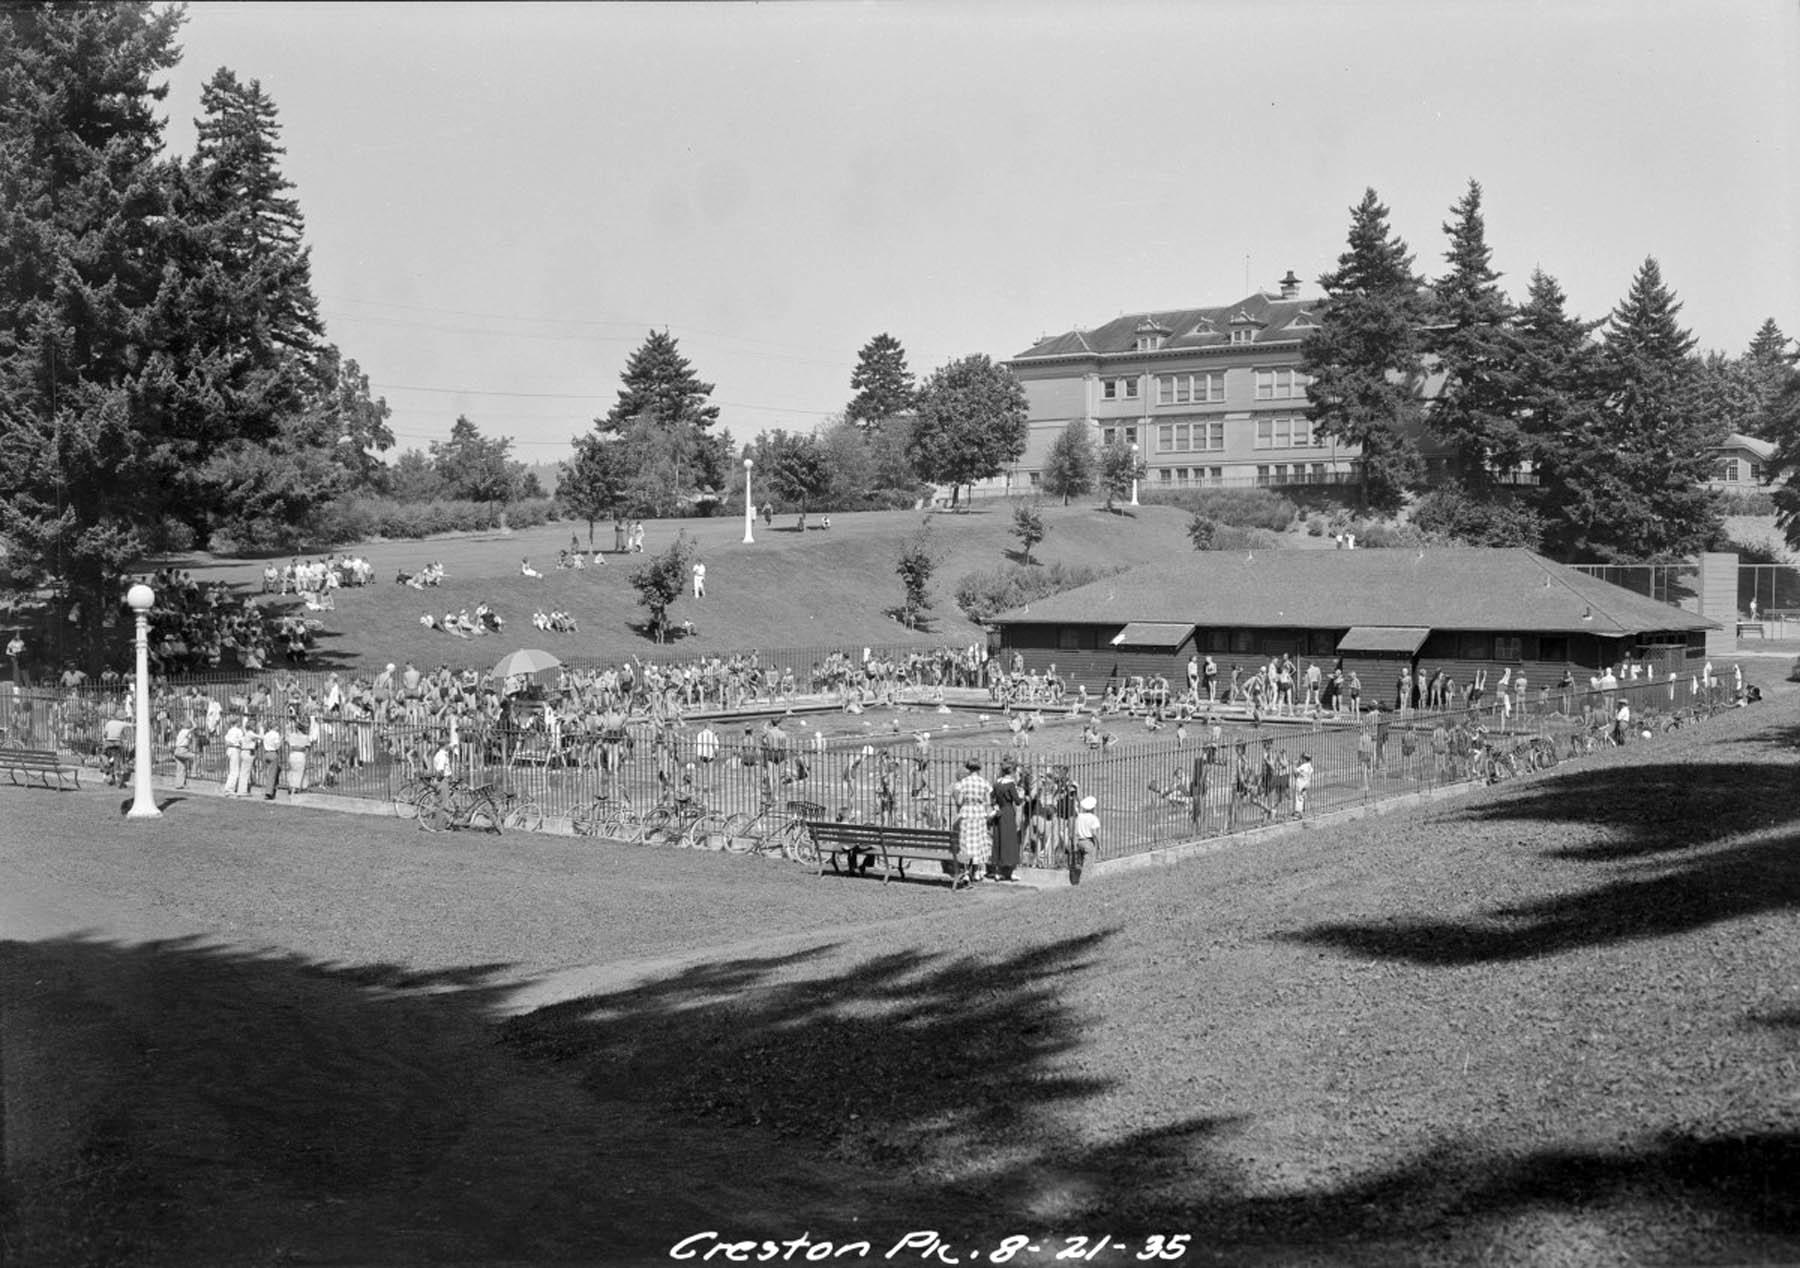 Creston park 1935 vintage portland for Public swimming pools portland or